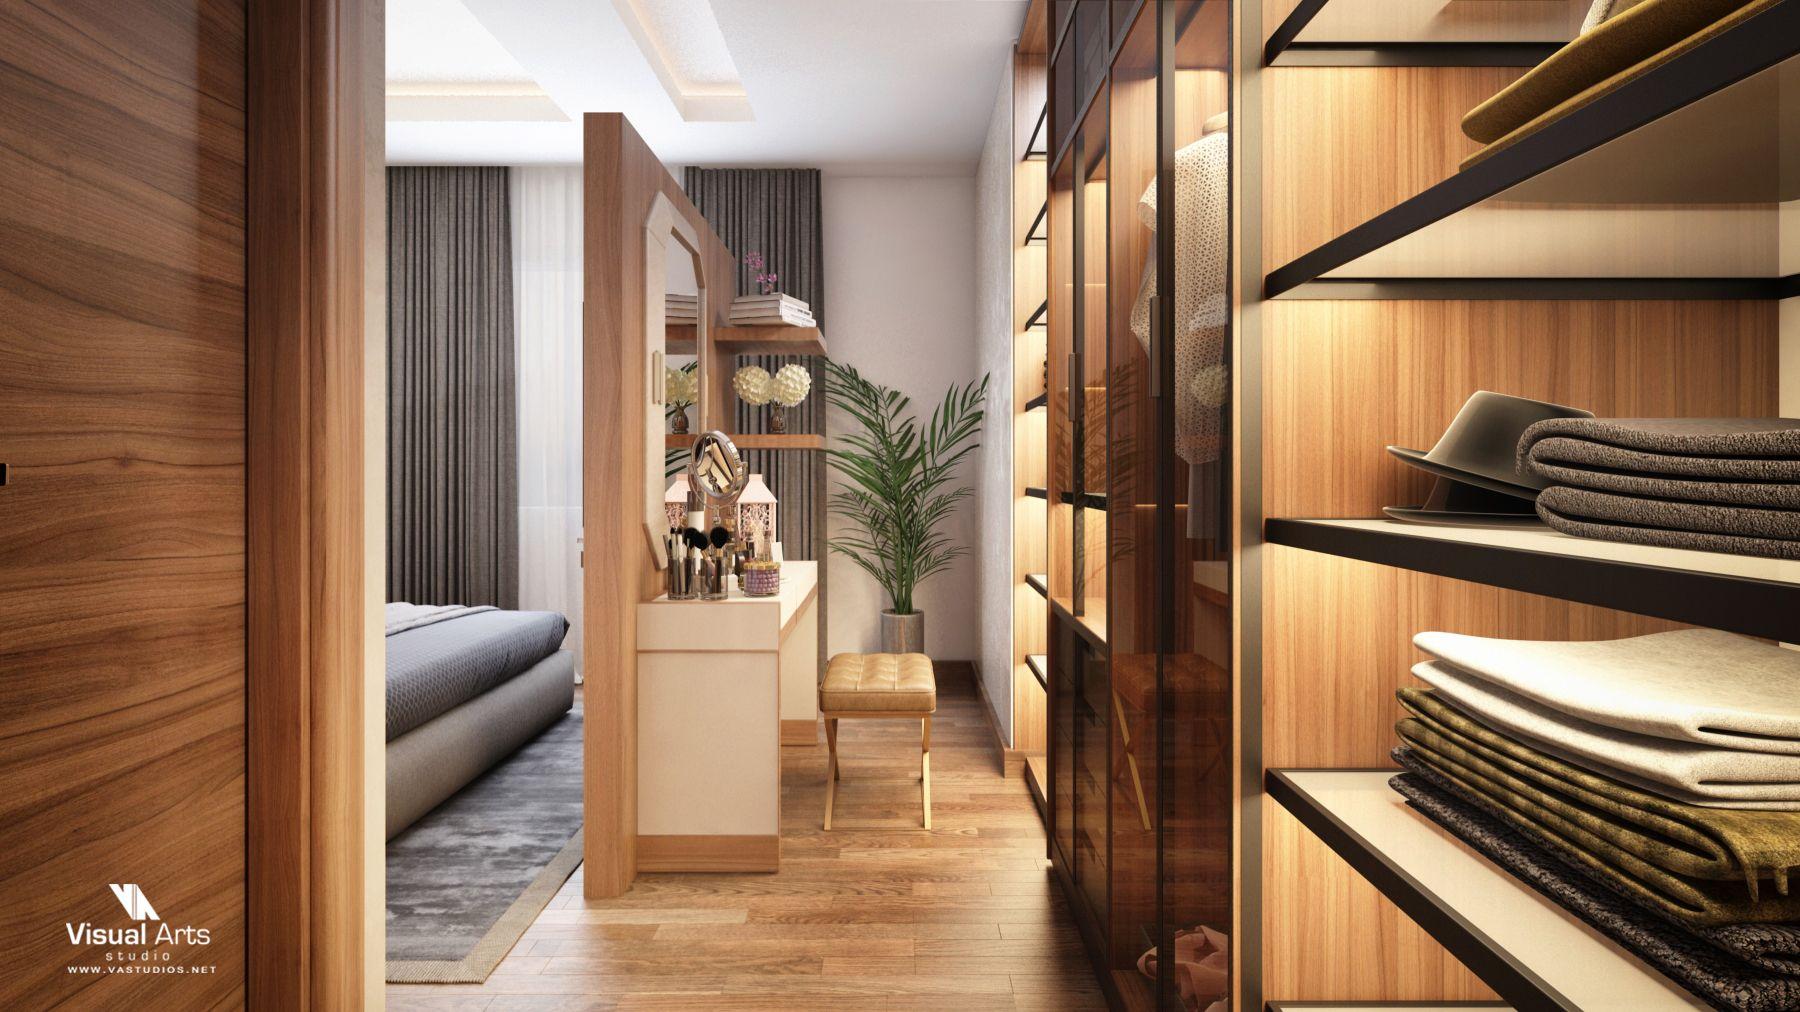 Bedroom Interior Design And Home Decor By Va Studio Interior Design Bedroom Home Bedroom Interior